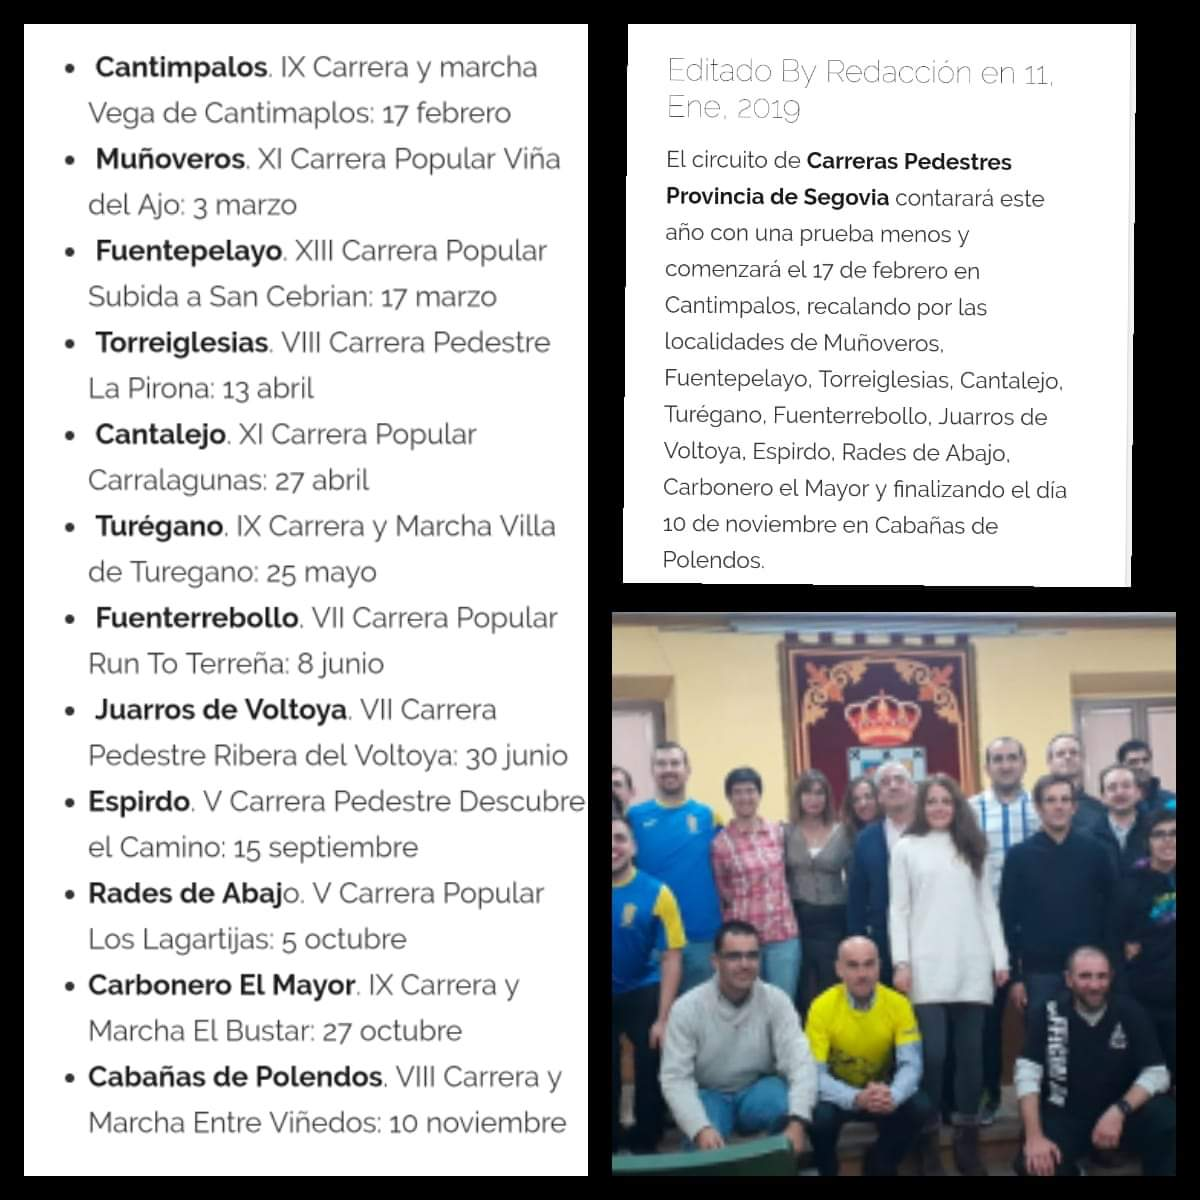 Circuito de carreras pedestres. Segovia 2019.